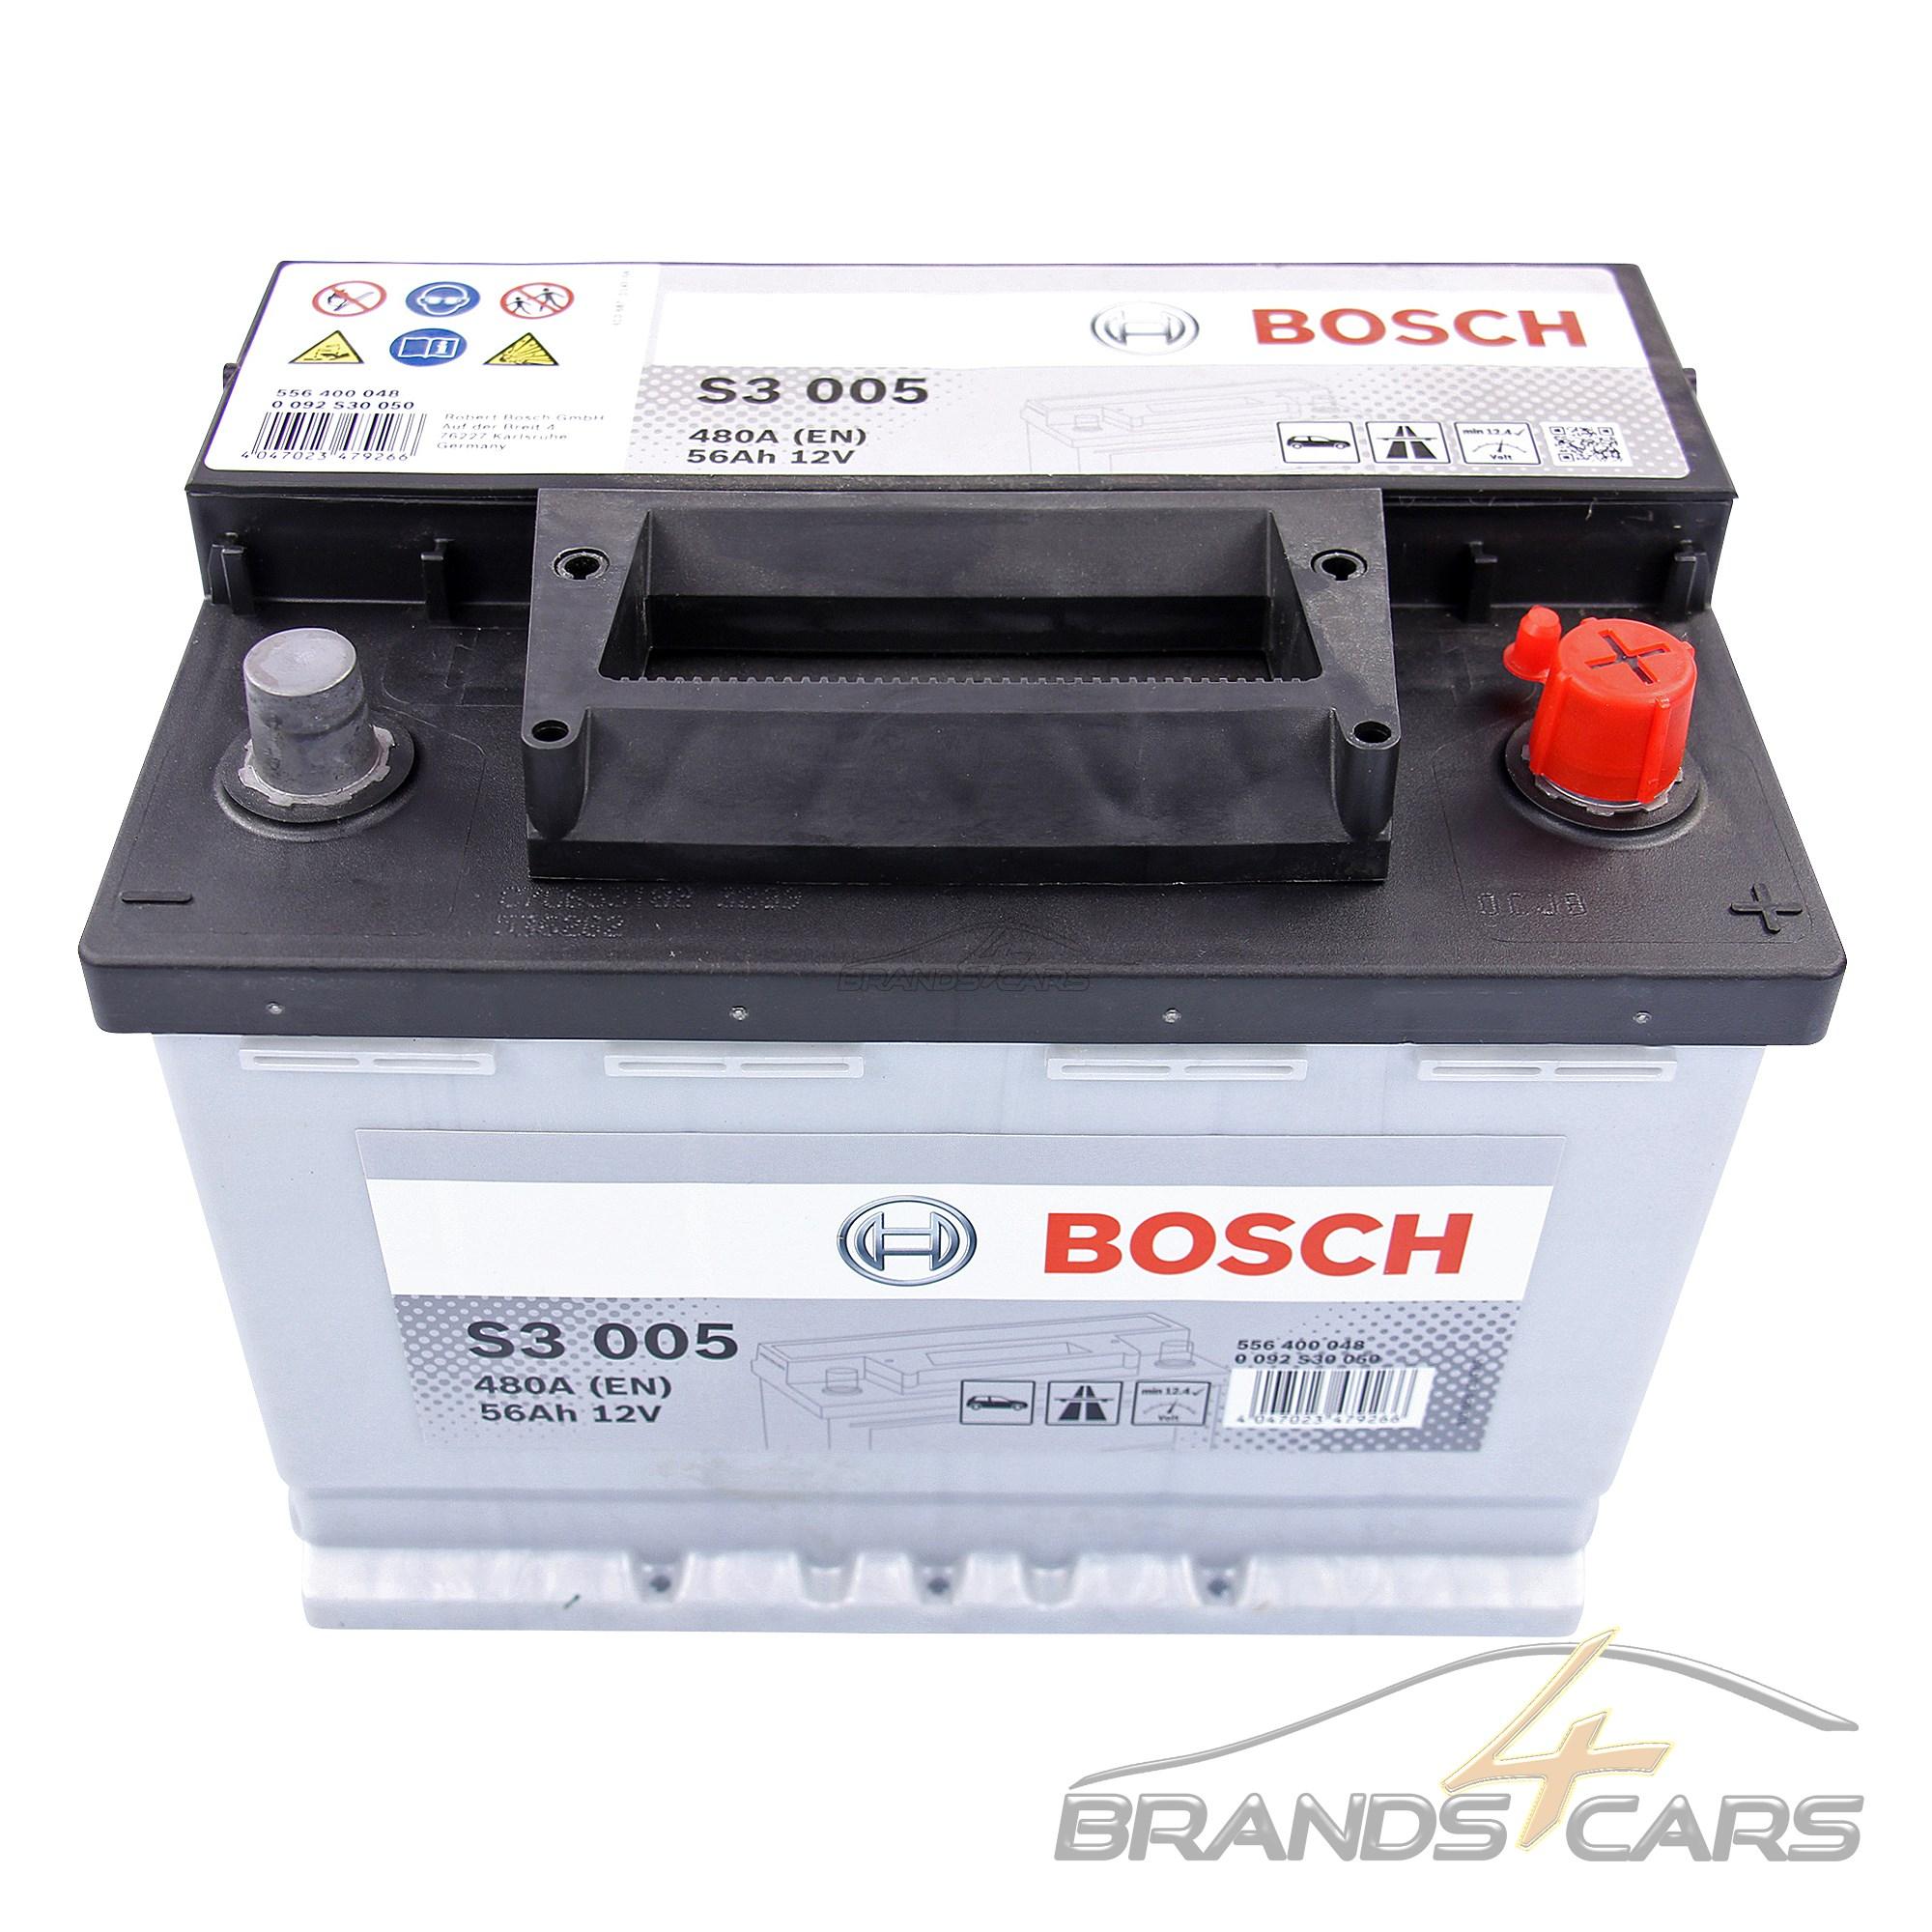 BOSCH S3 005 56Ah 480A 12V AUTOBATTERIE STARTERBATTERIE PKW-BATTERIE 31835386